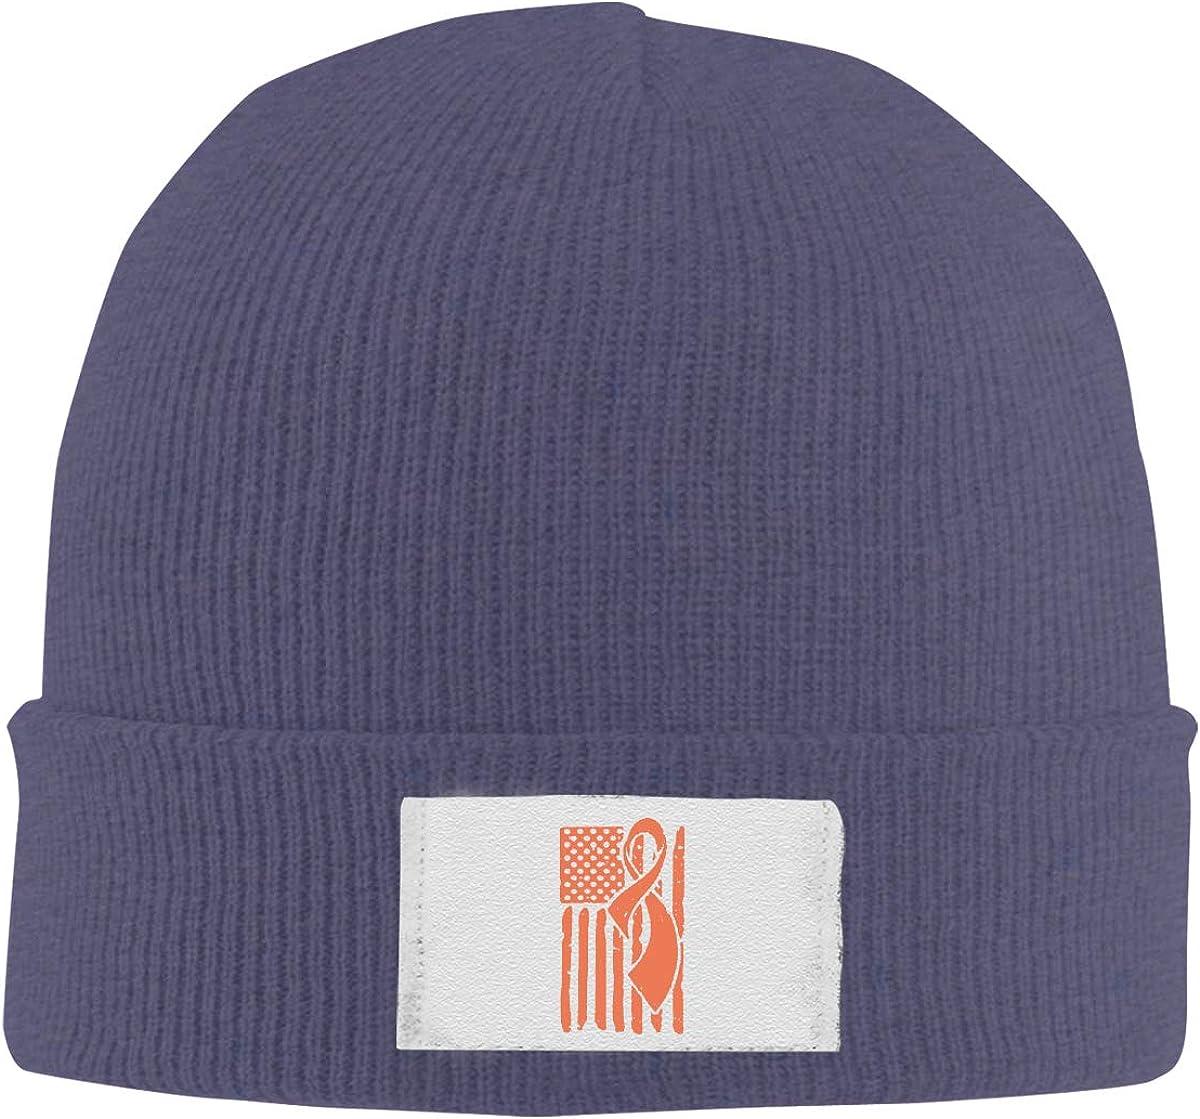 Dunpaiaa Skull Caps Leukemia Awareness Ribbon American Flag Winter Warm Knit Hats Stretchy Cuff Beanie Hat Black